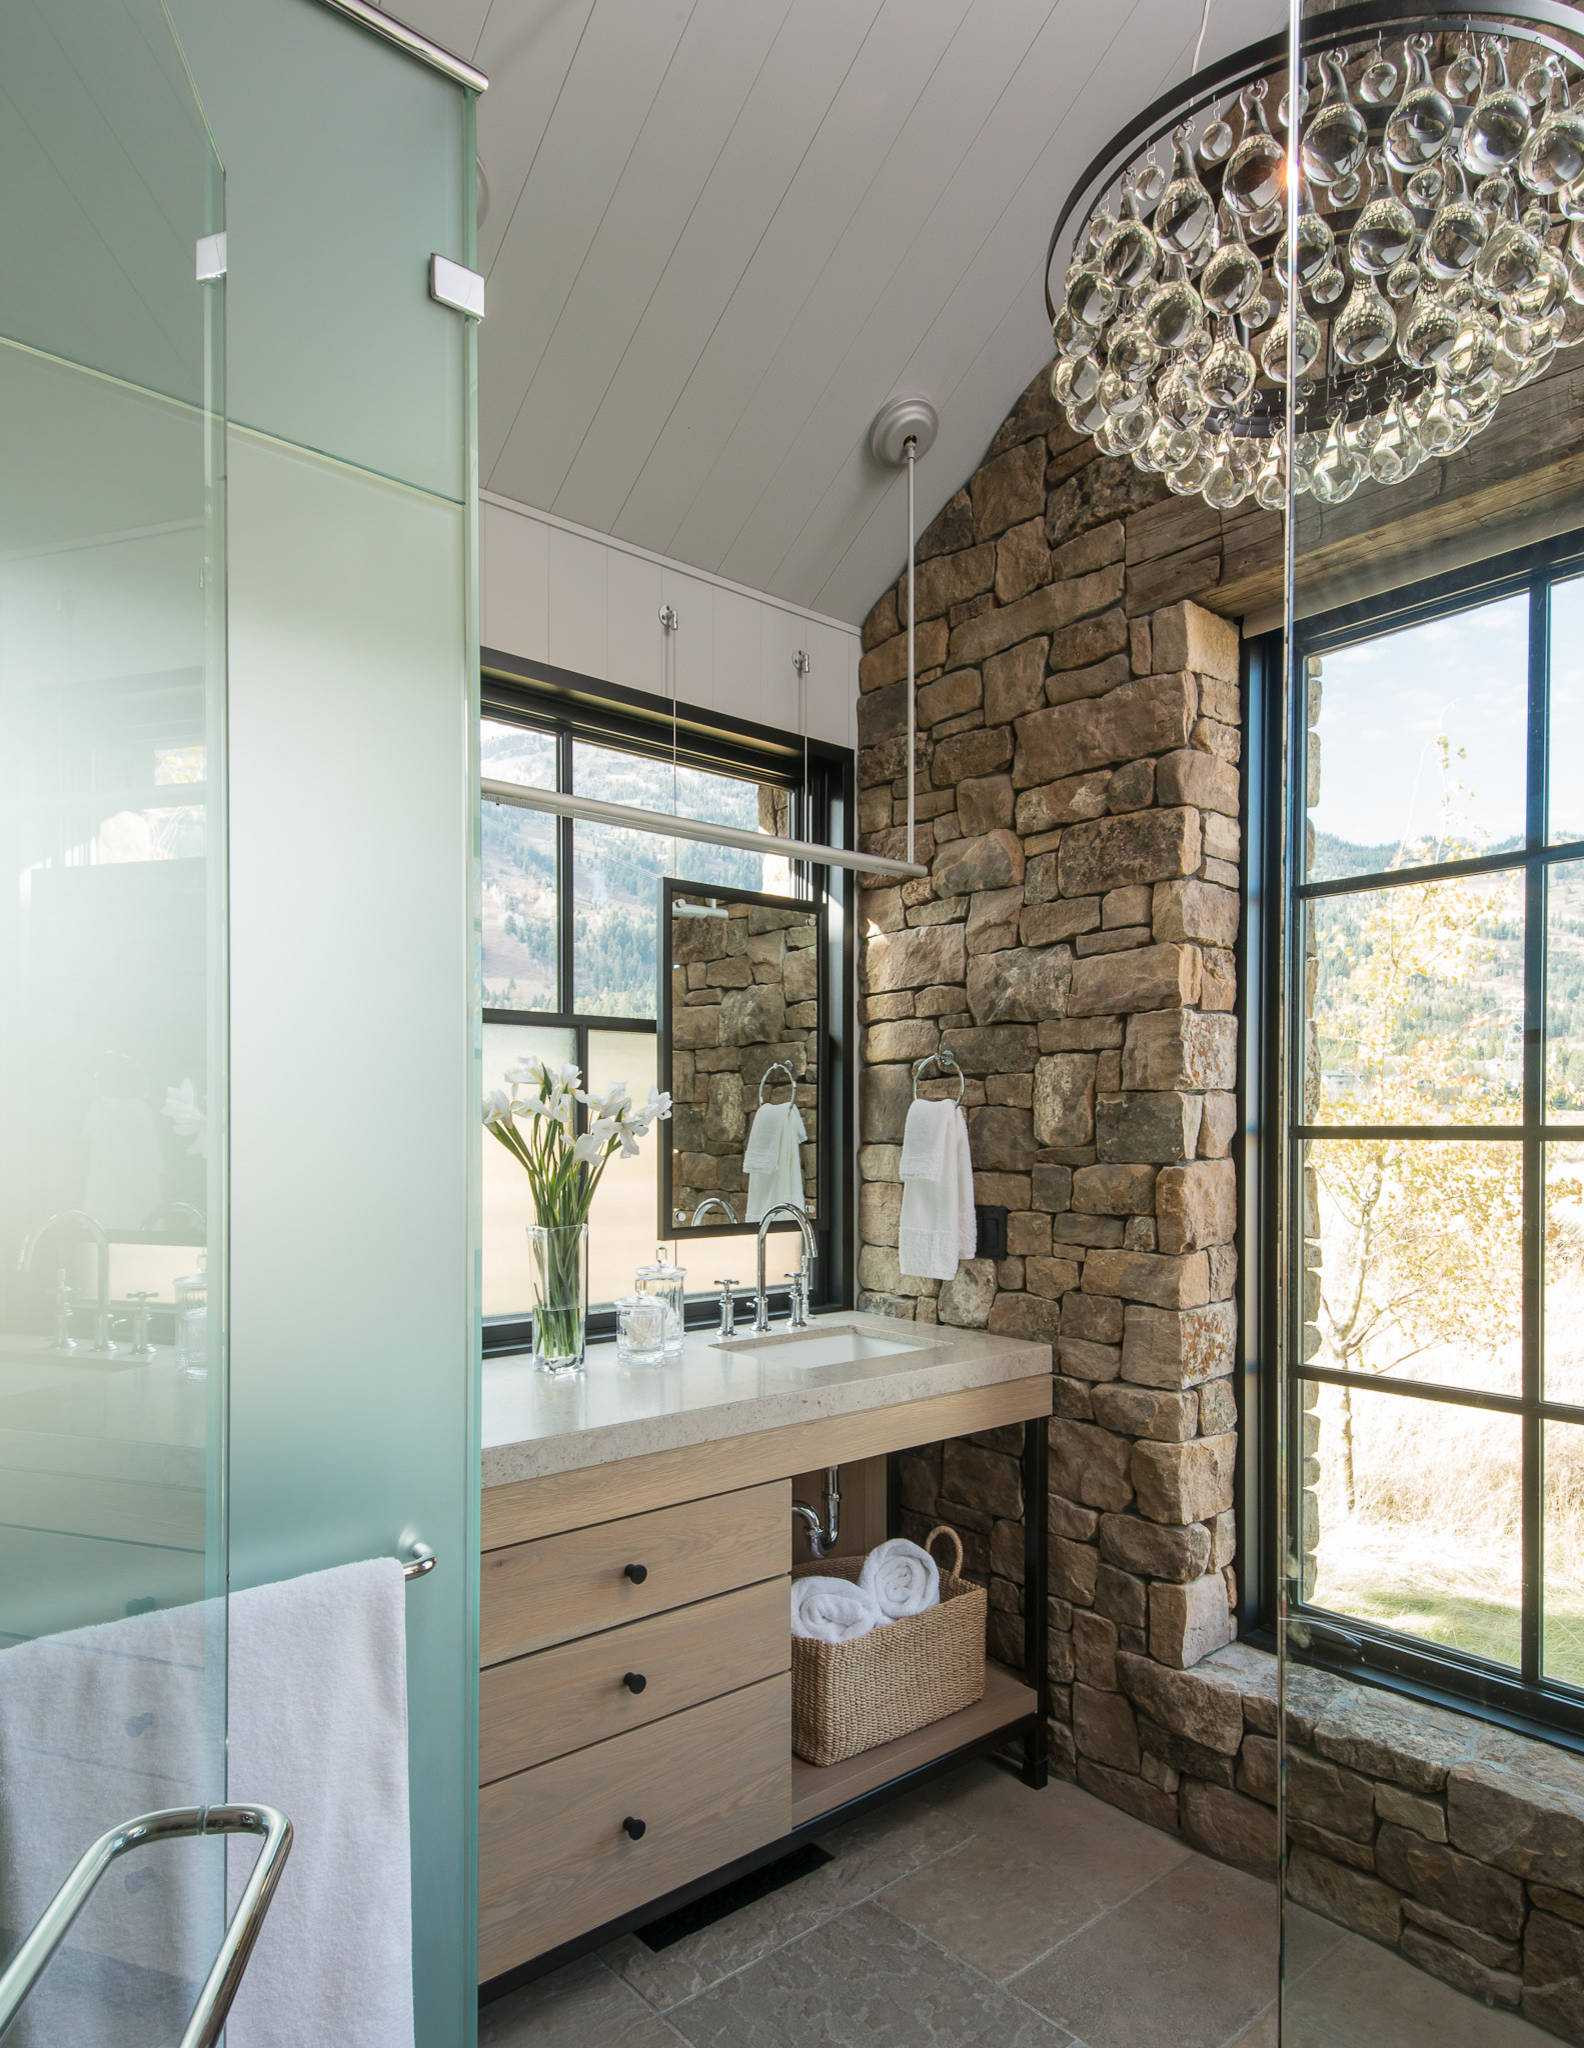 Design A Bathroom  16 Fantastic Rustic Bathroom Designs That Will Take Your